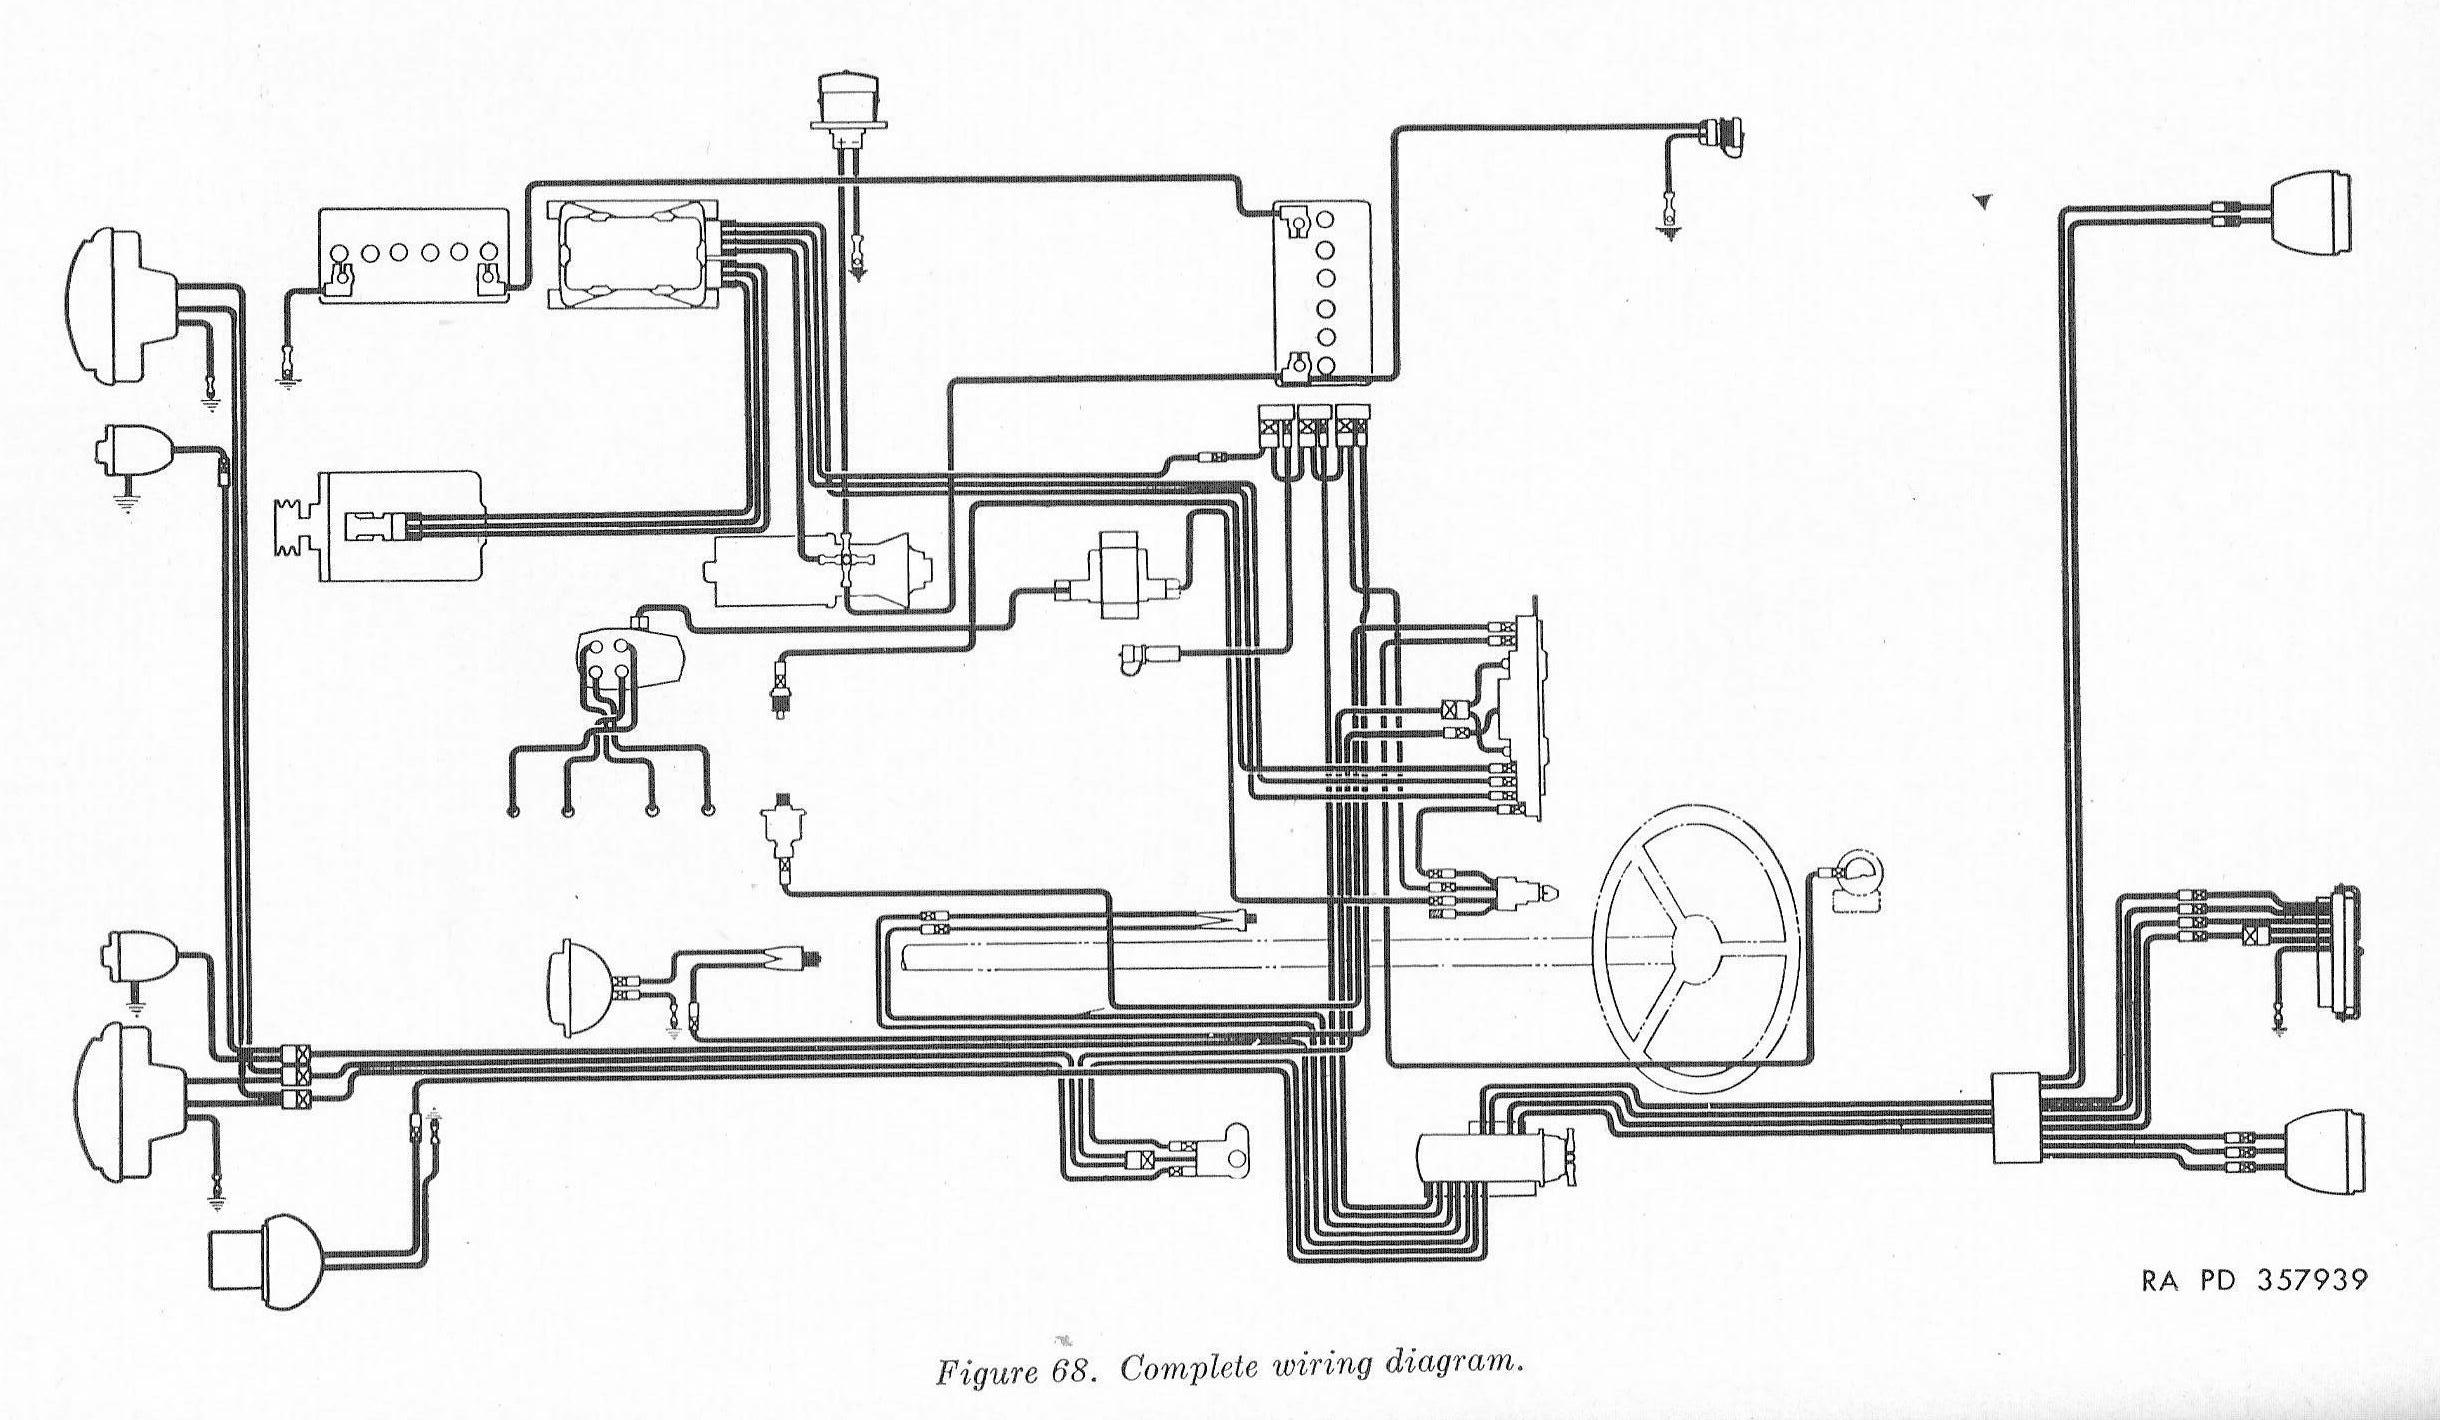 1955 Willys Jeep Wiring Diagram Bmw F30 Wiring Diagram Oonboard Yenpancane Jeanjaures37 Fr